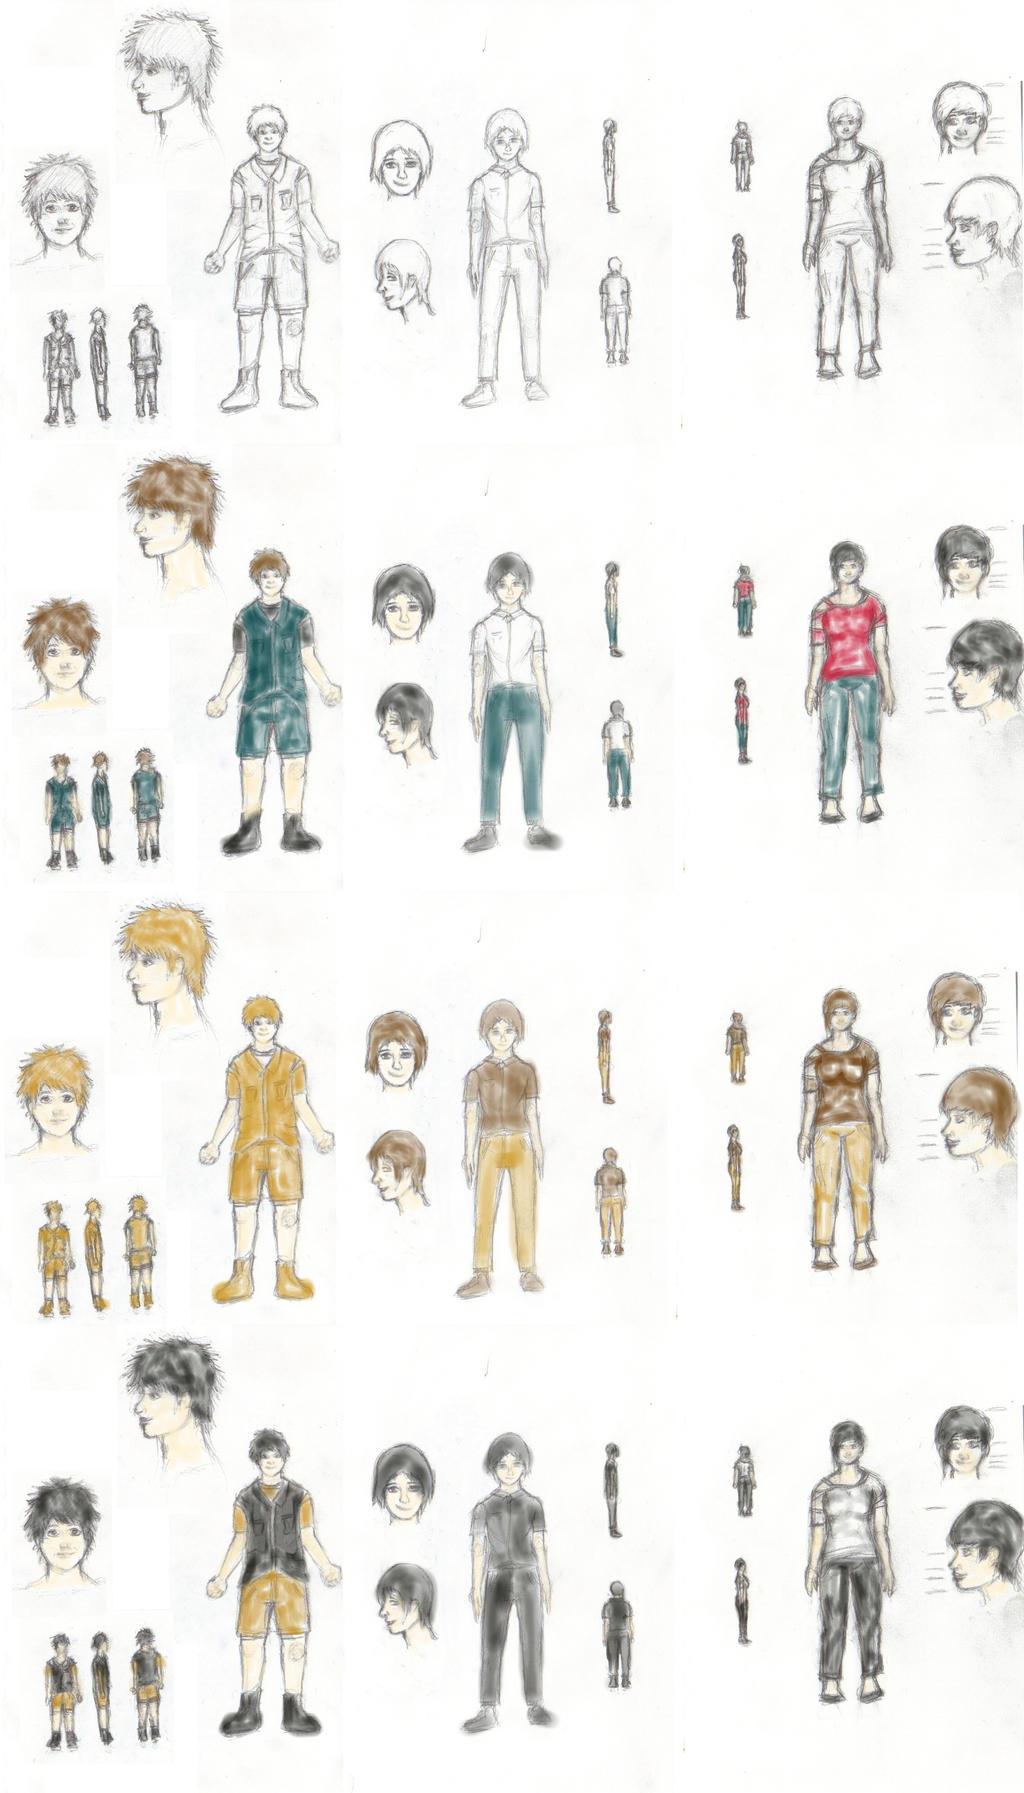 AnimationCharacterGroup1 by anime-halo